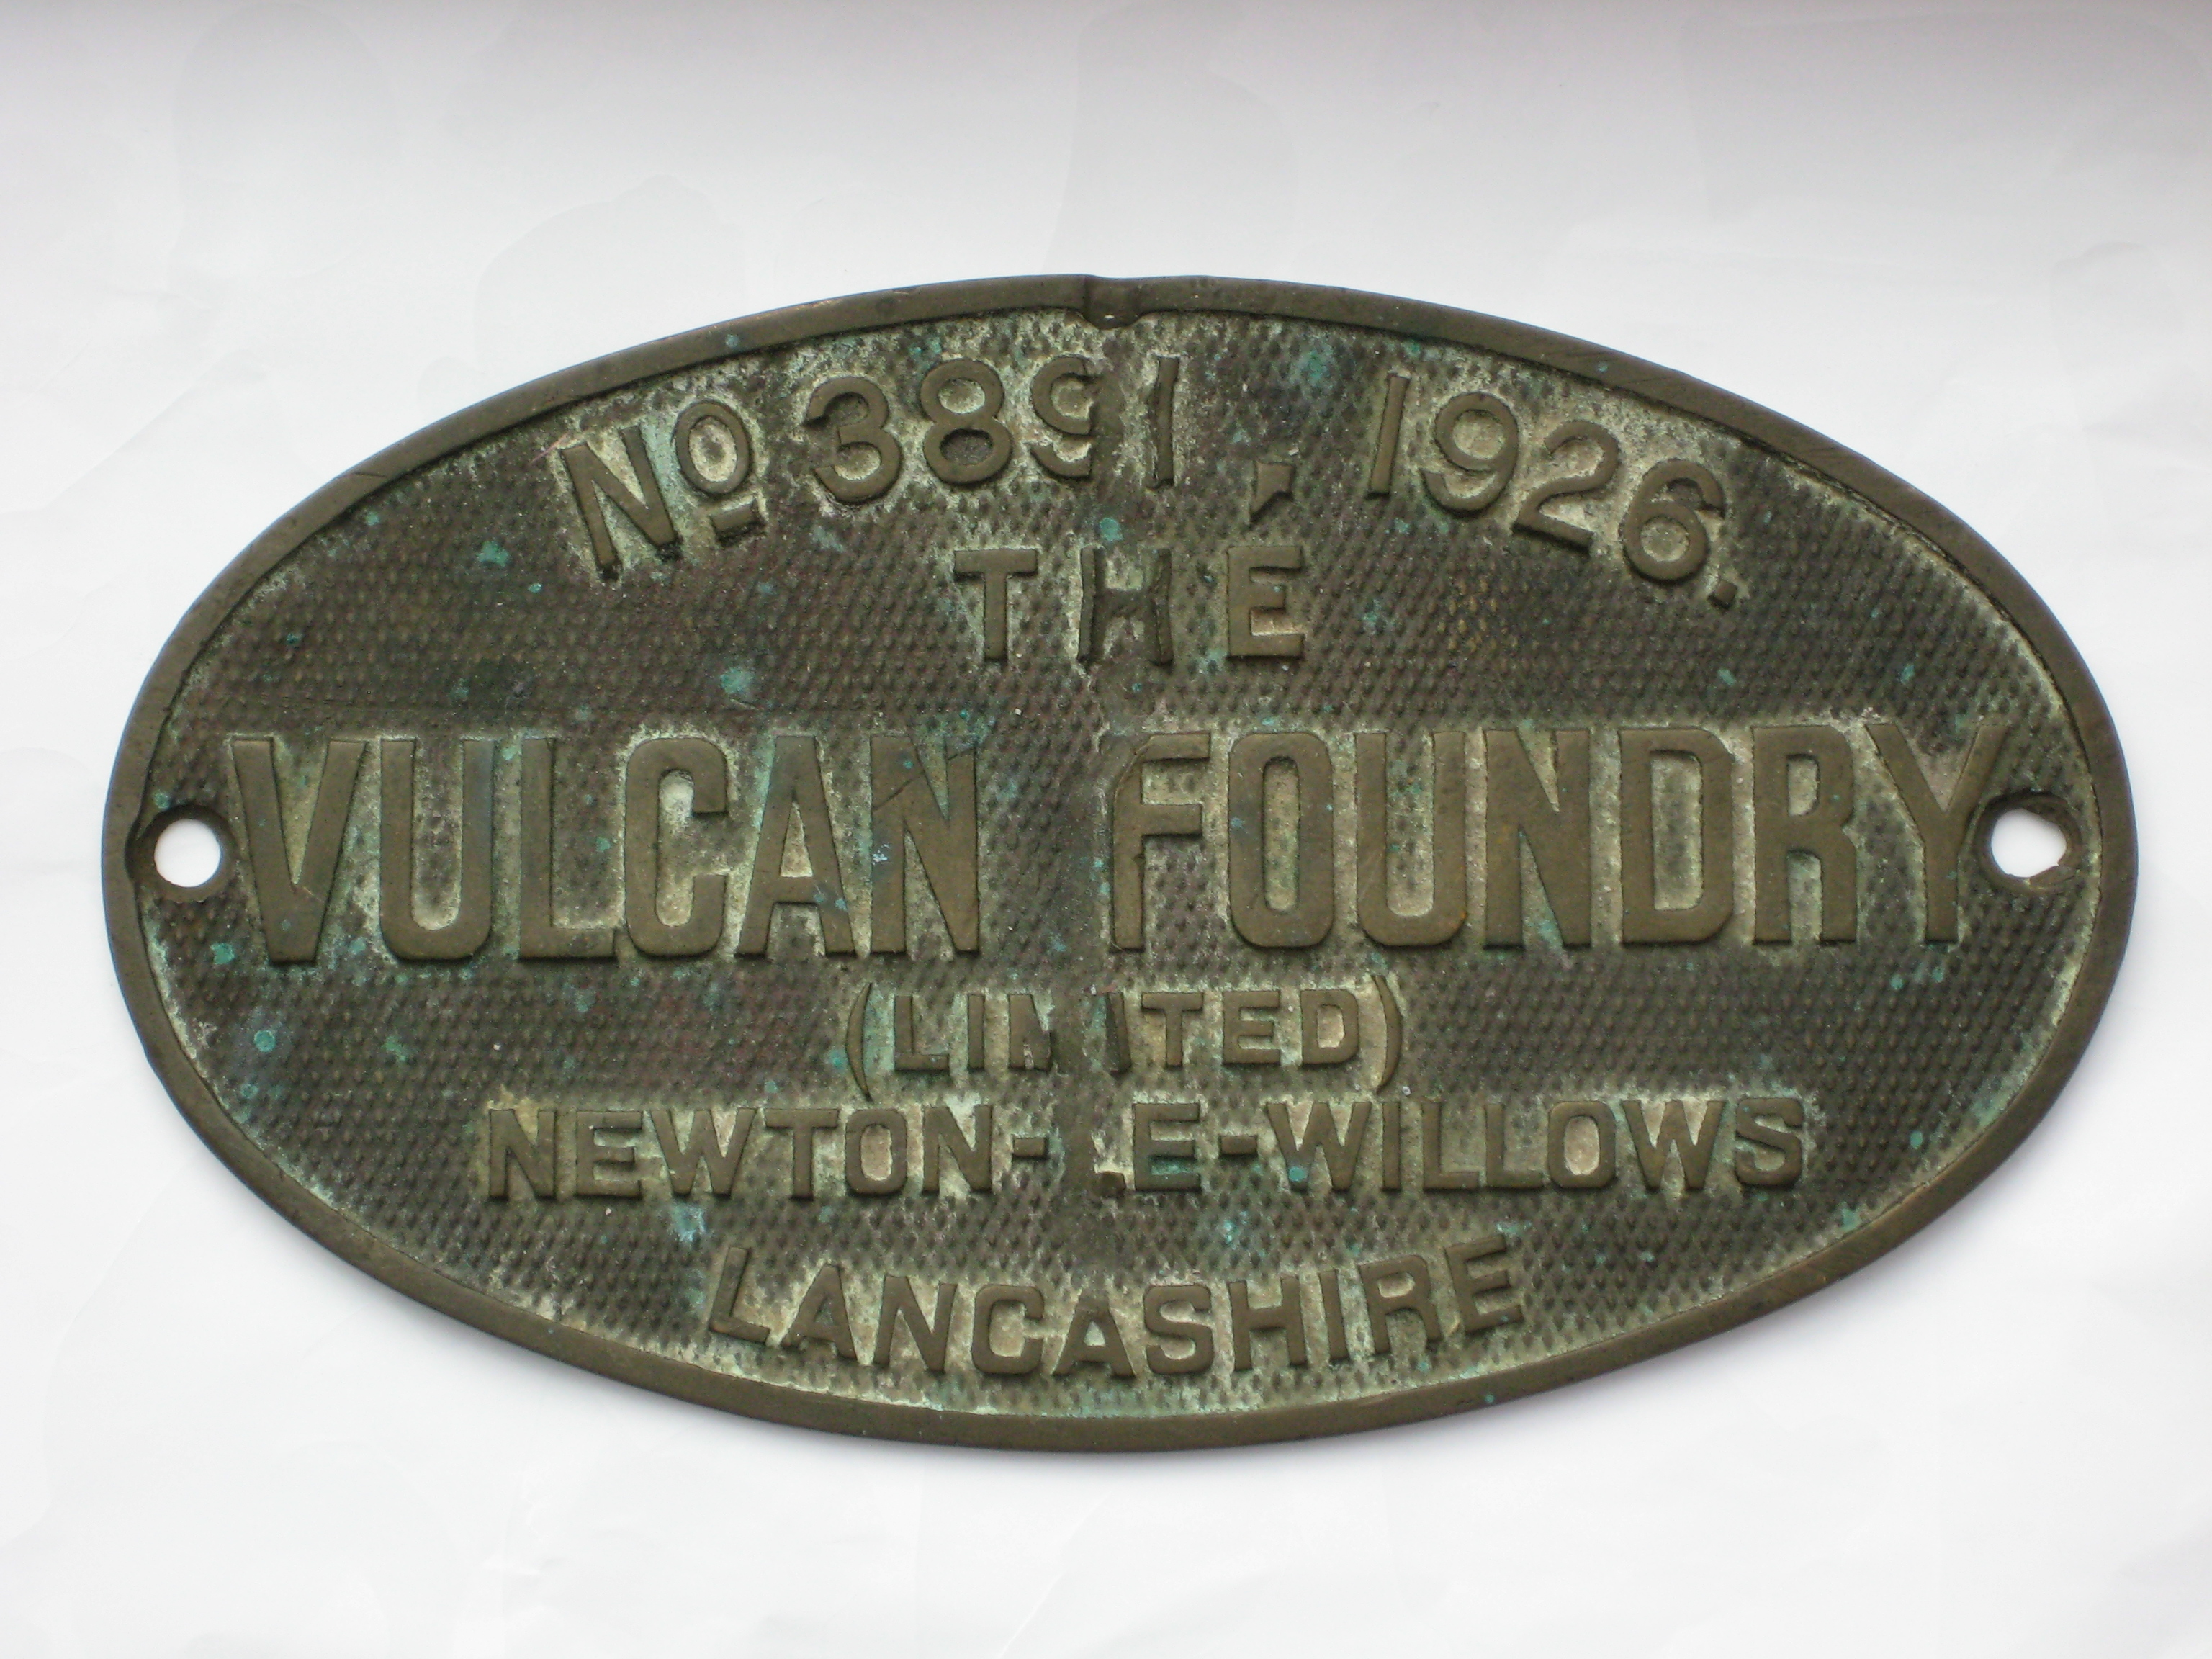 Vulcan-foundry_3891.JPG